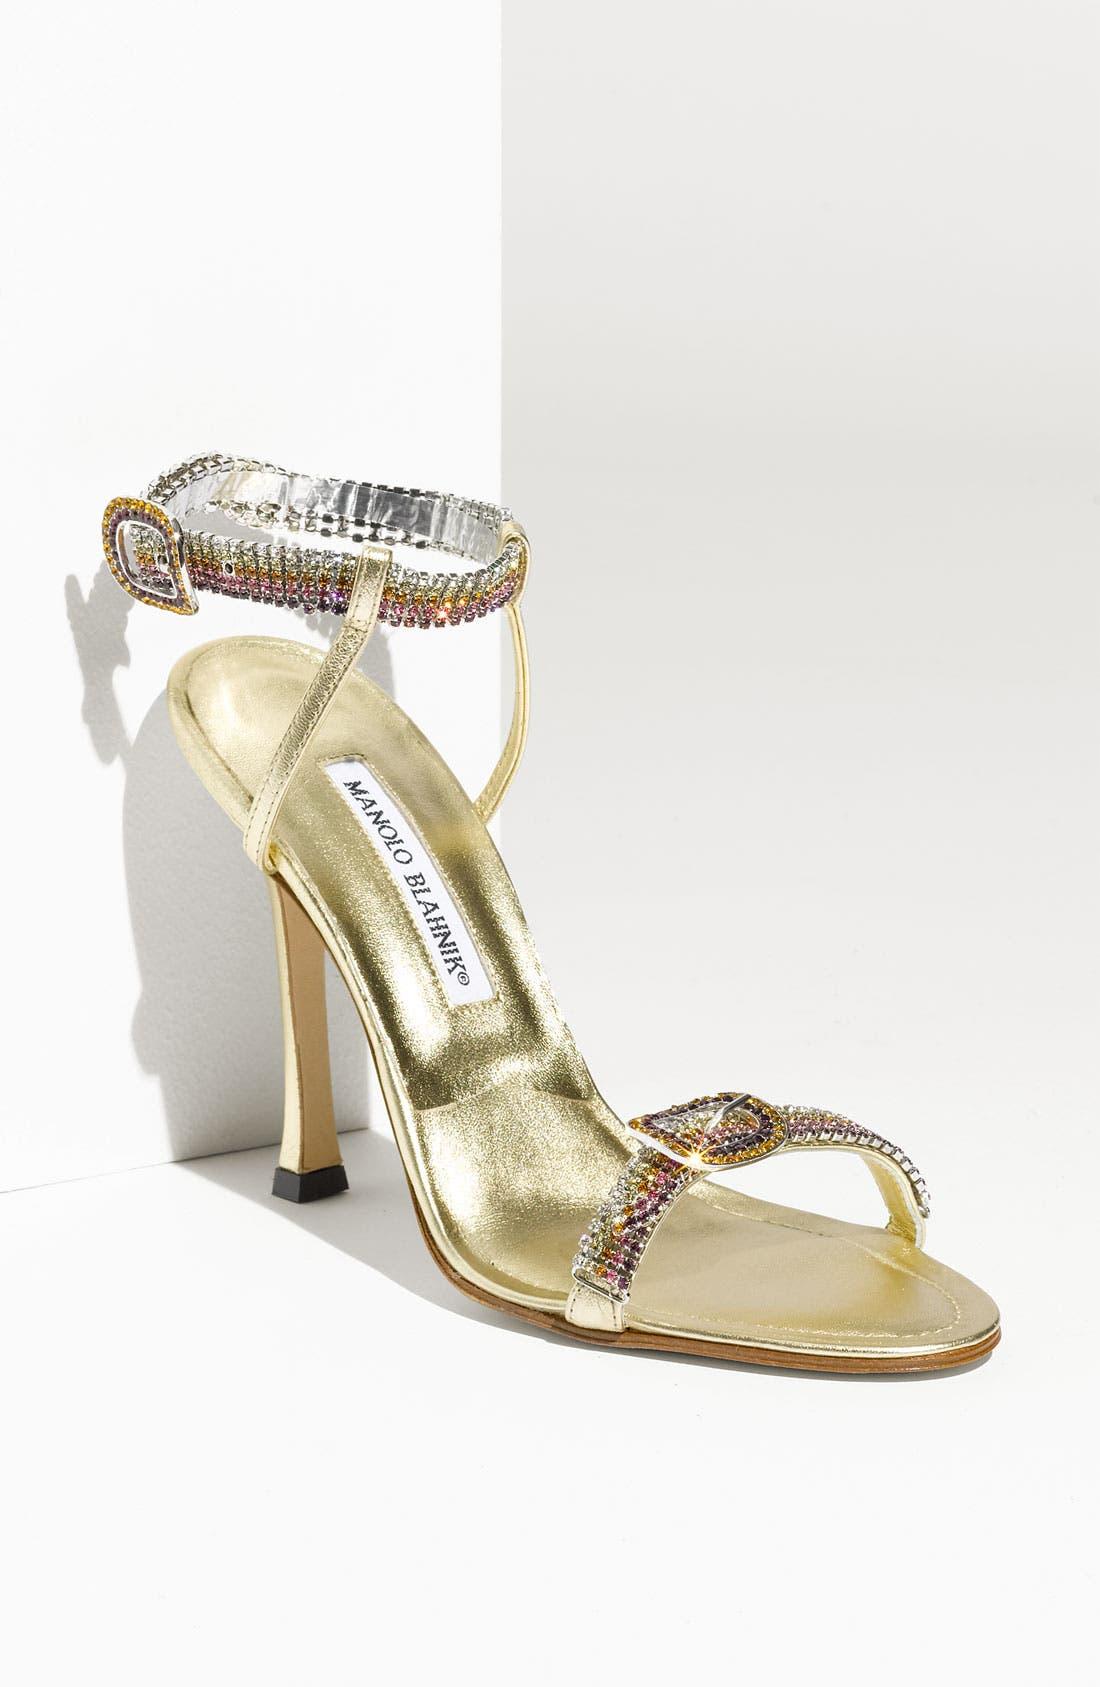 Alternate Image 1 Selected - Manolo Blahnik 'Janetba' Rhinestone Strap Sandal